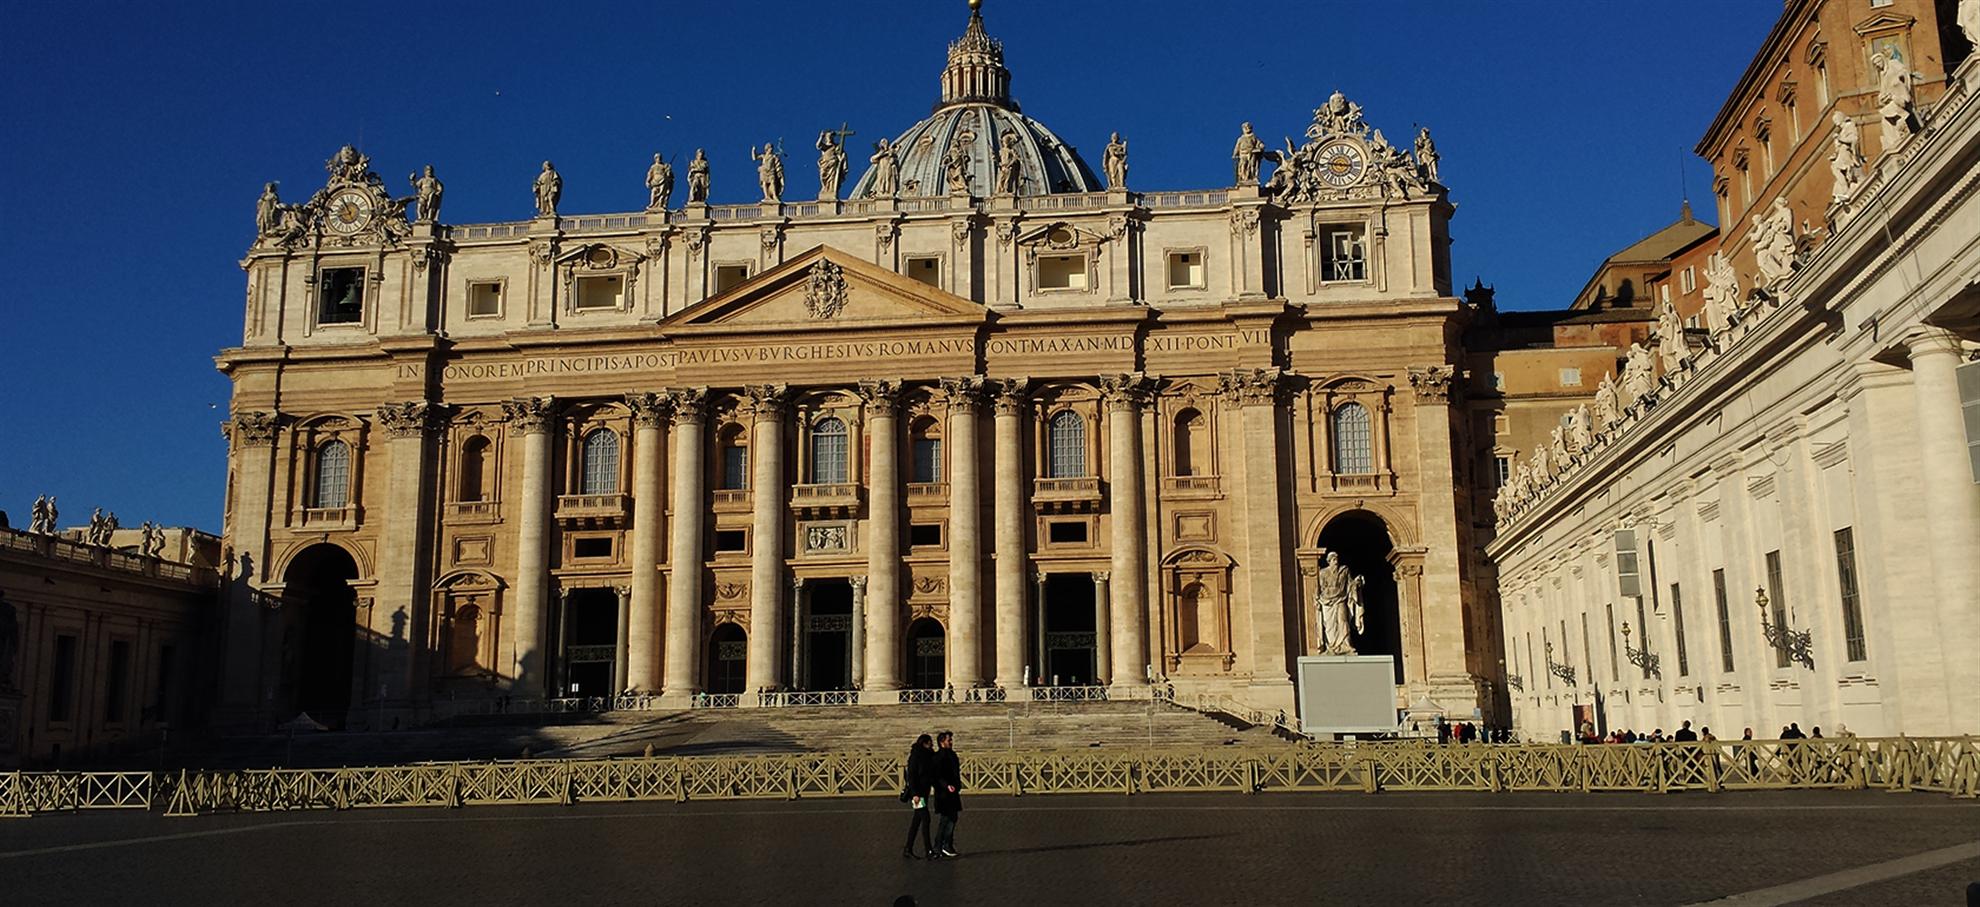 Vatikanische Museen & Sixtinische Kapelle am Freitagabend